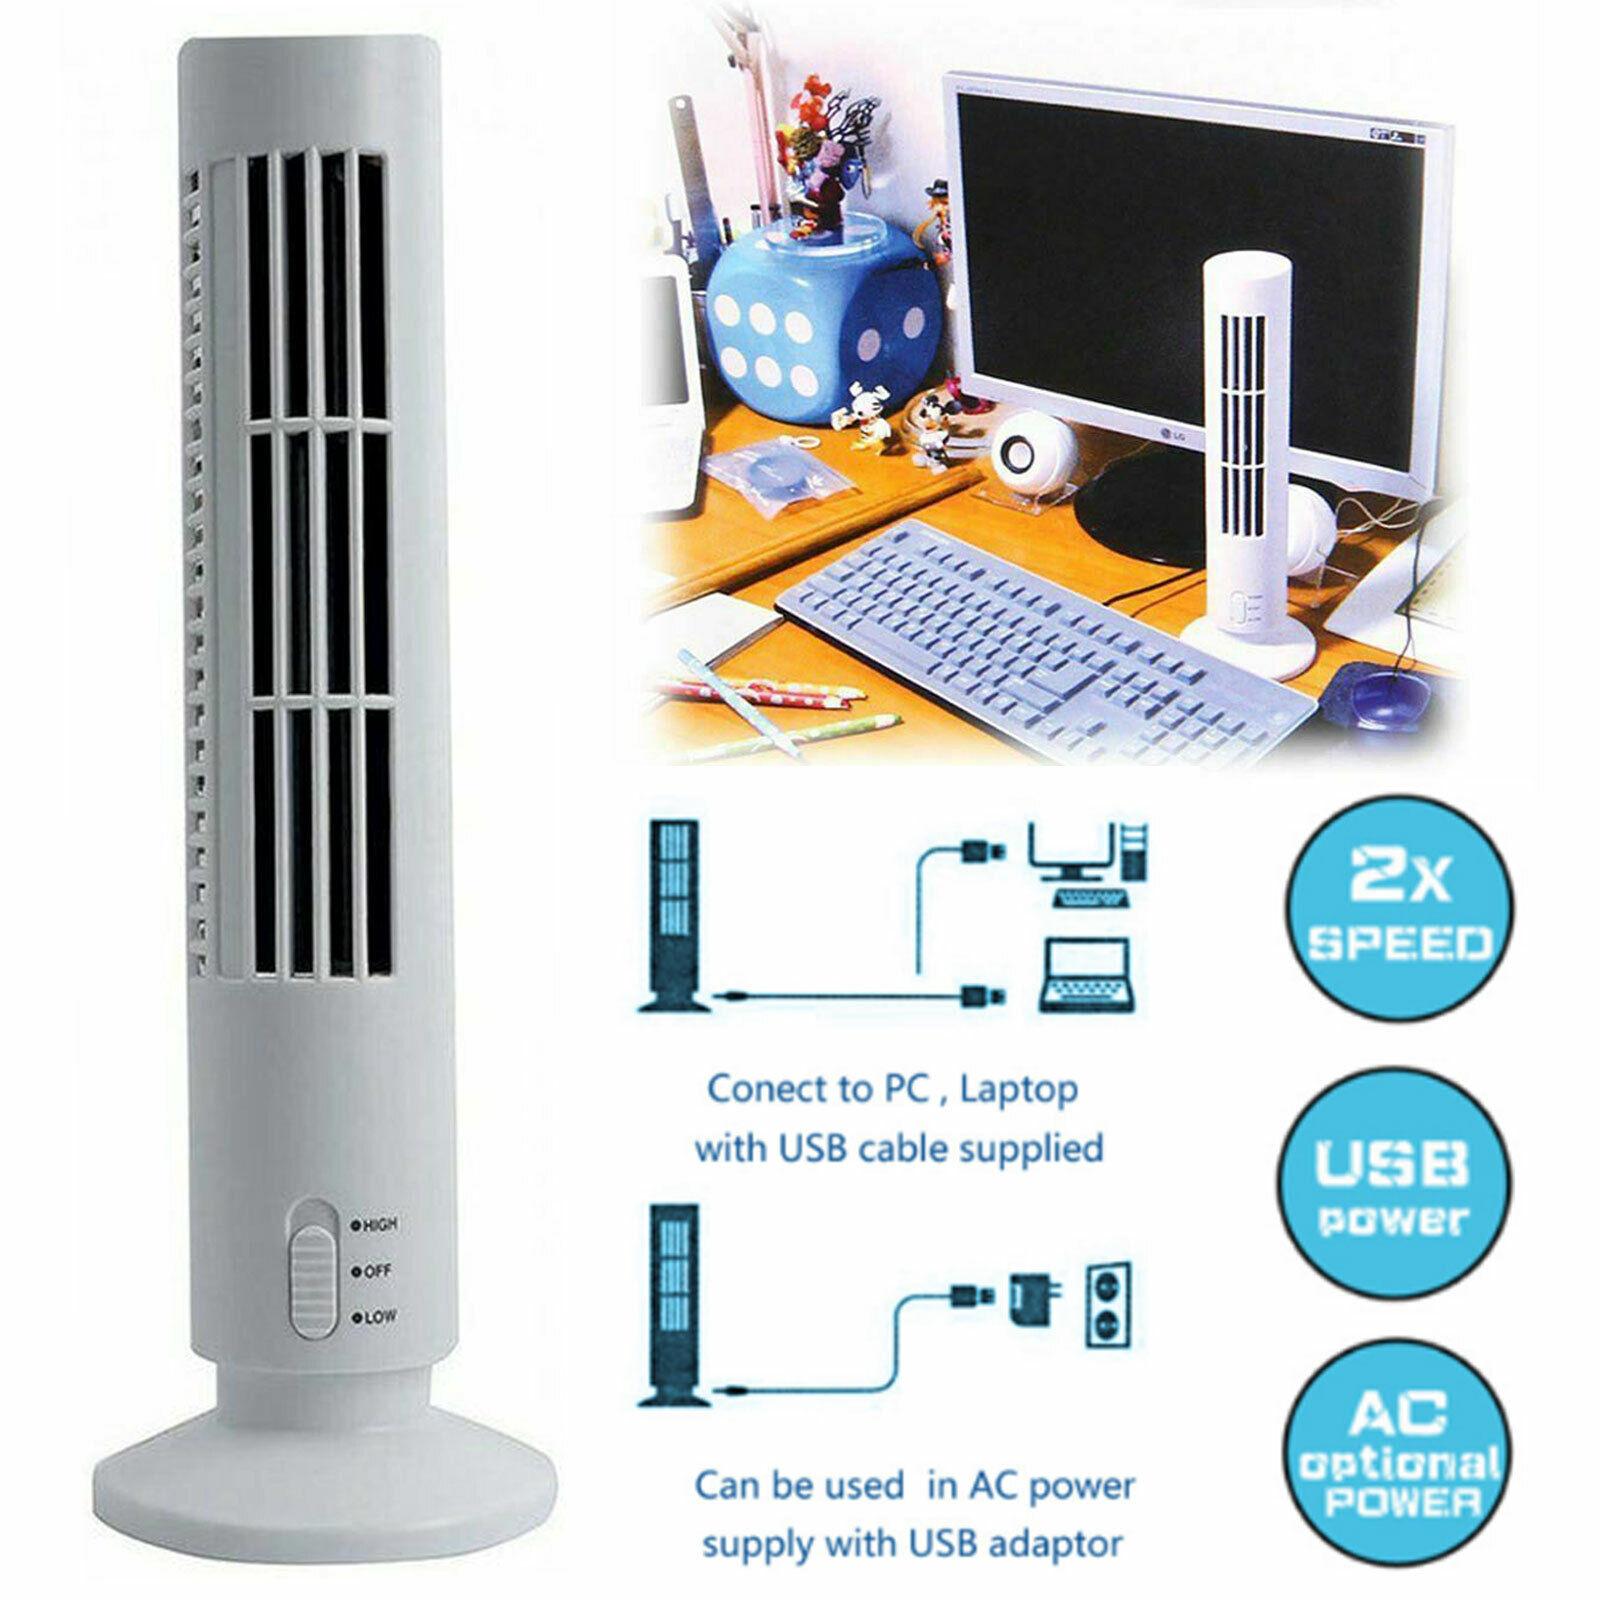 Alician Novelty Portable USB Air Multiplier Desktop Cooling Cool Desk Tower Fan Black 330105mm